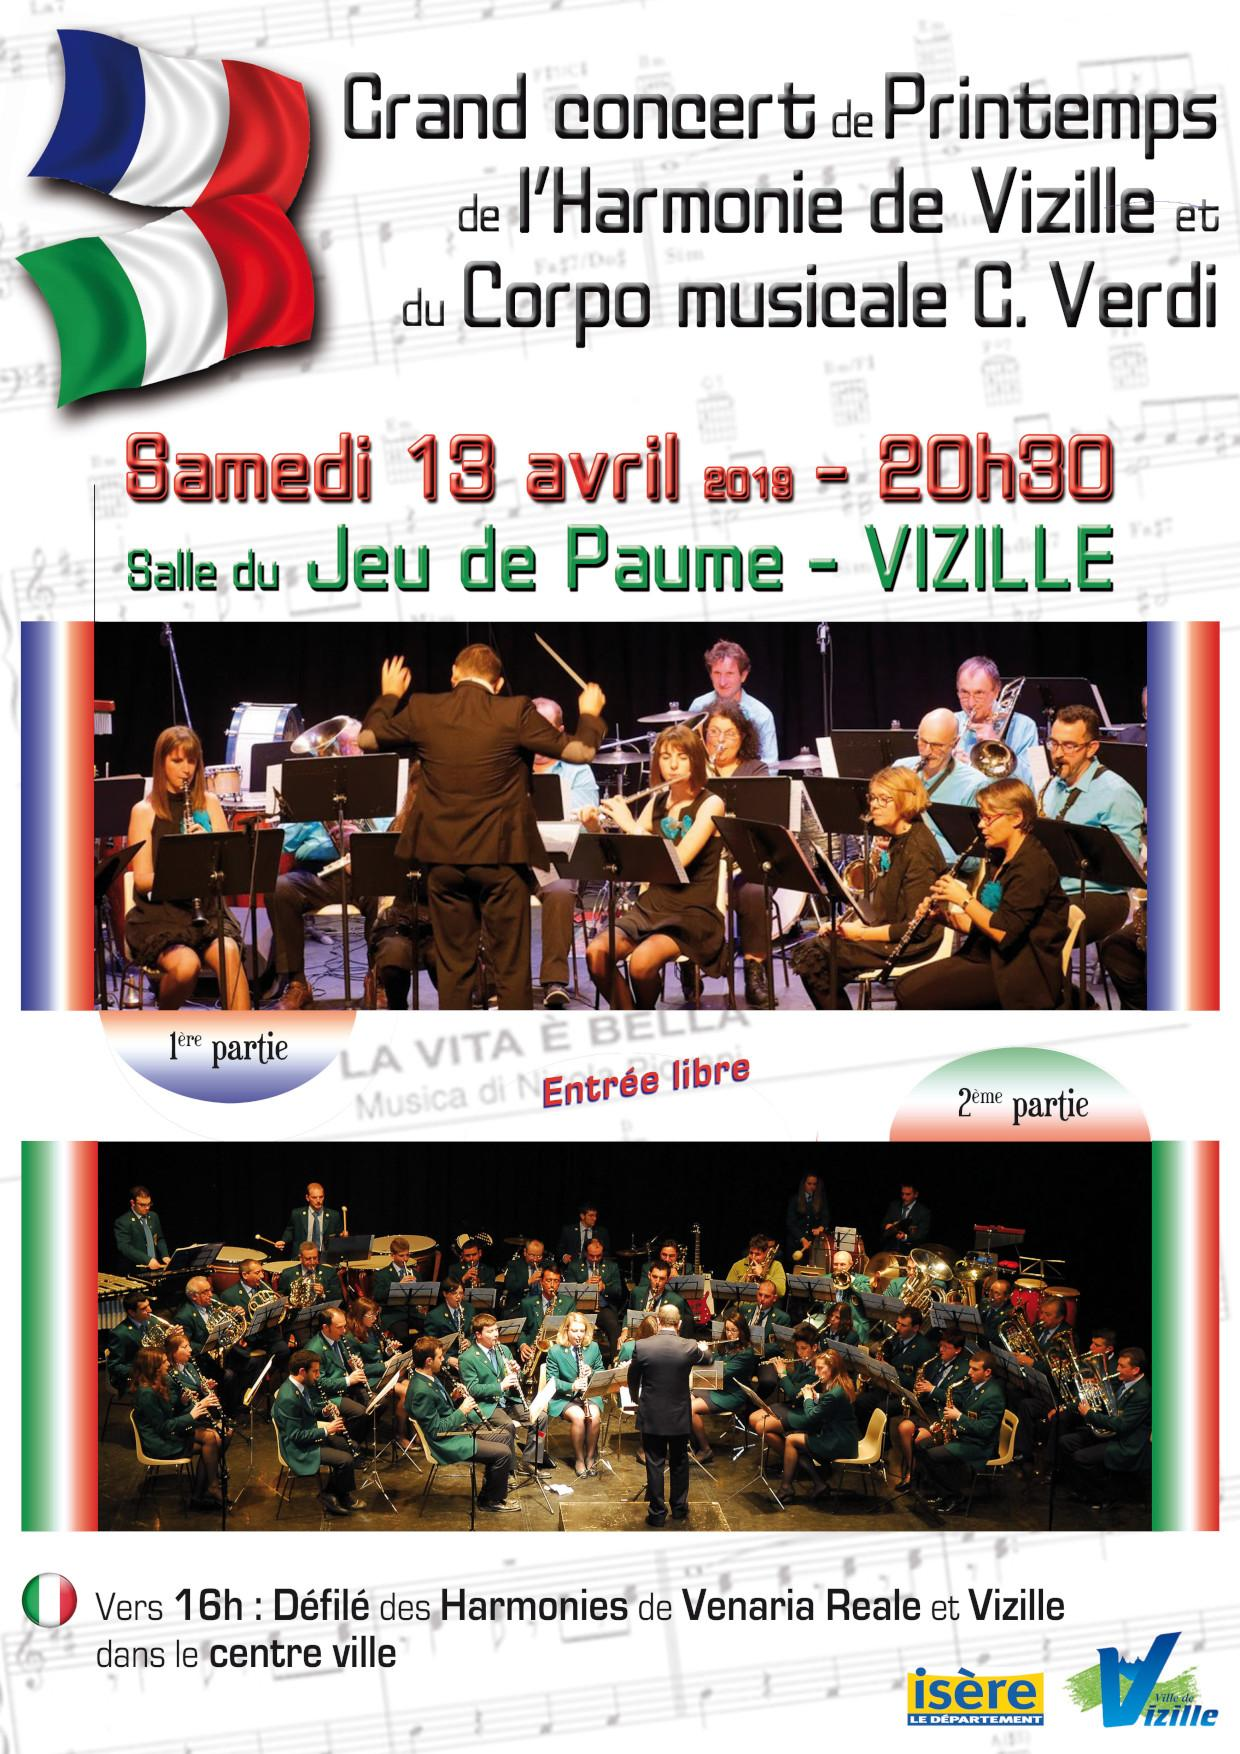 Concert Harmonie vizille 13 avril 2019